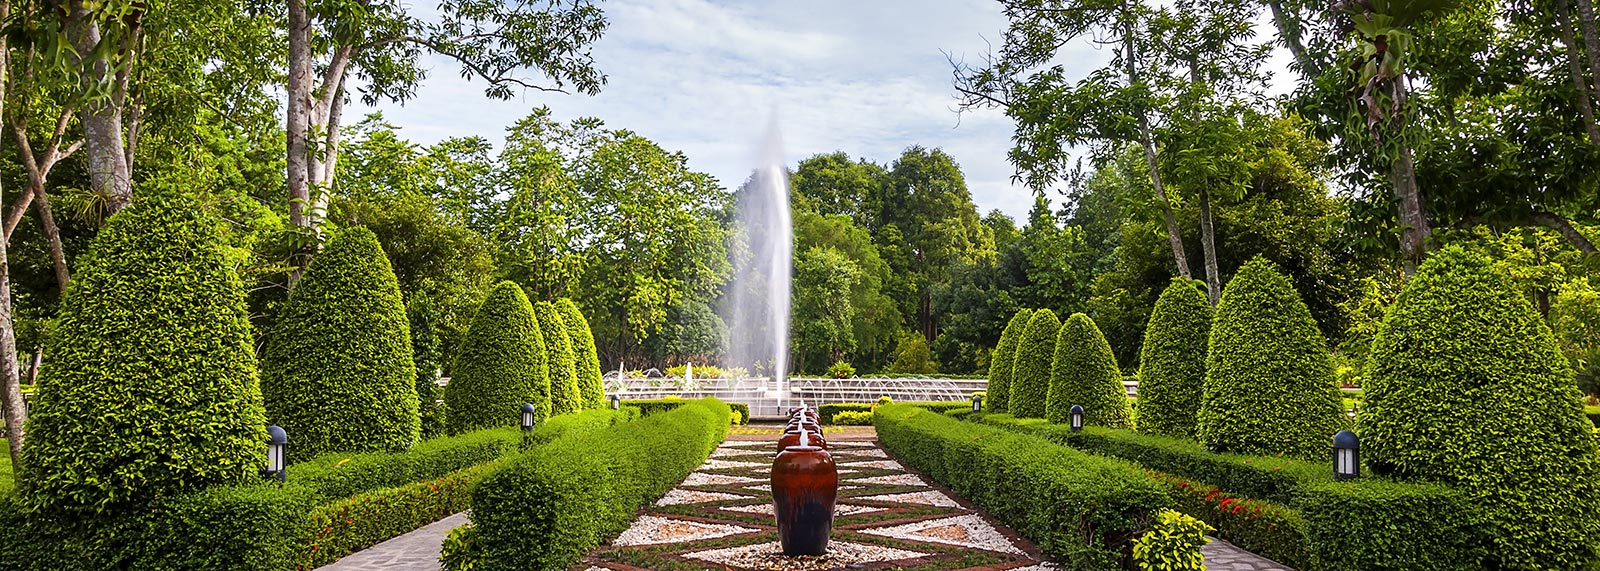 Giardini all 39 italiana dellavalle giardini - Giardino all italiana ...